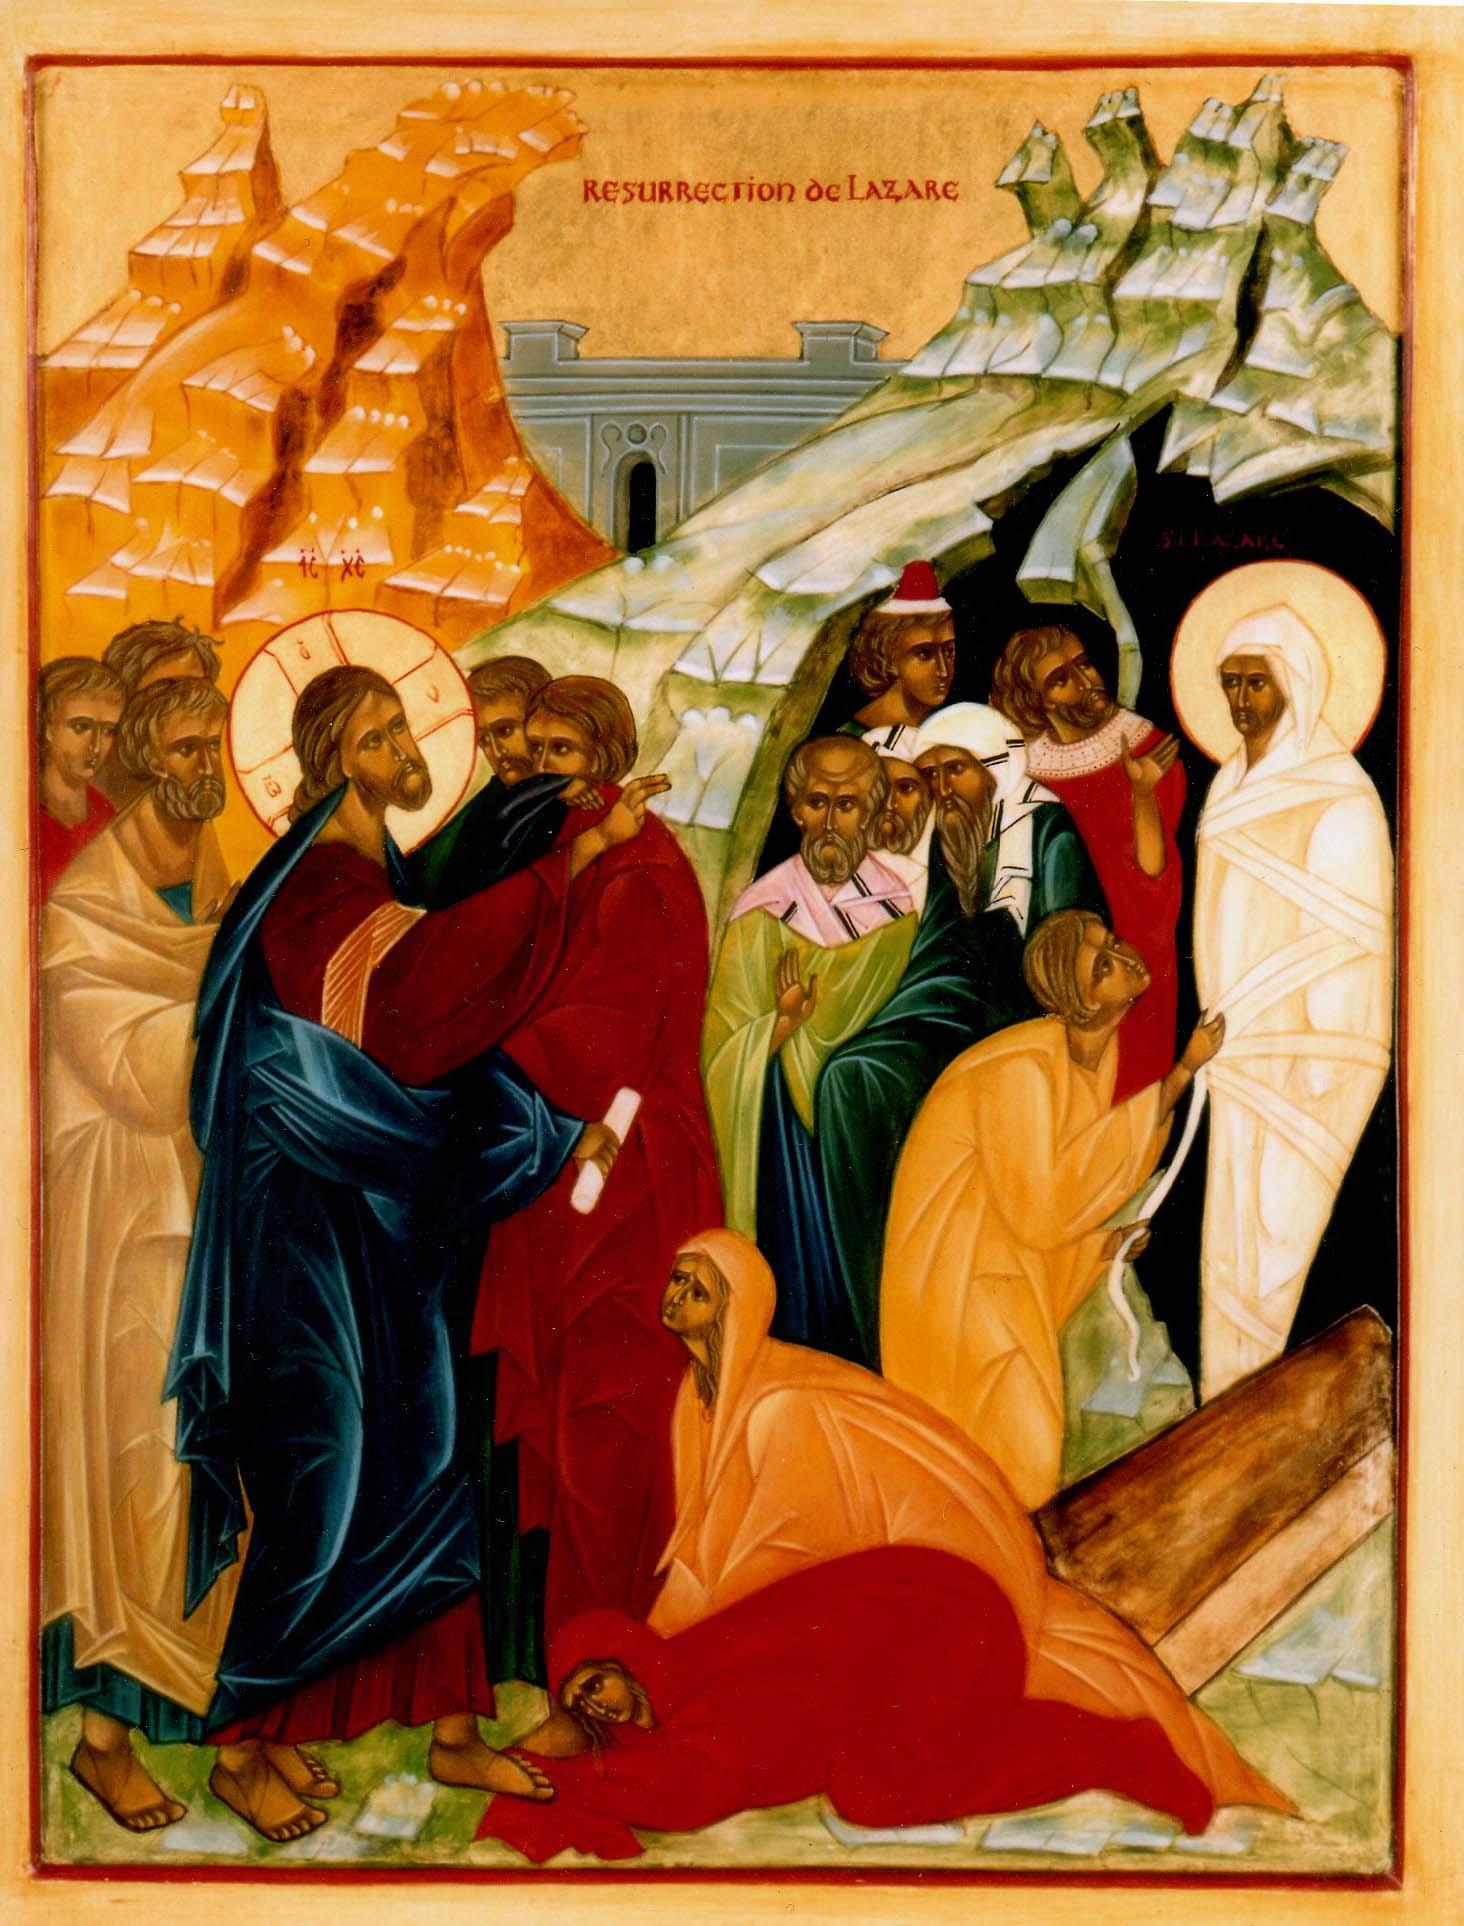 Inviter Dieu à visiter ce qui nous tue dans Communauté spirituelle RsurrectiondeLazare2